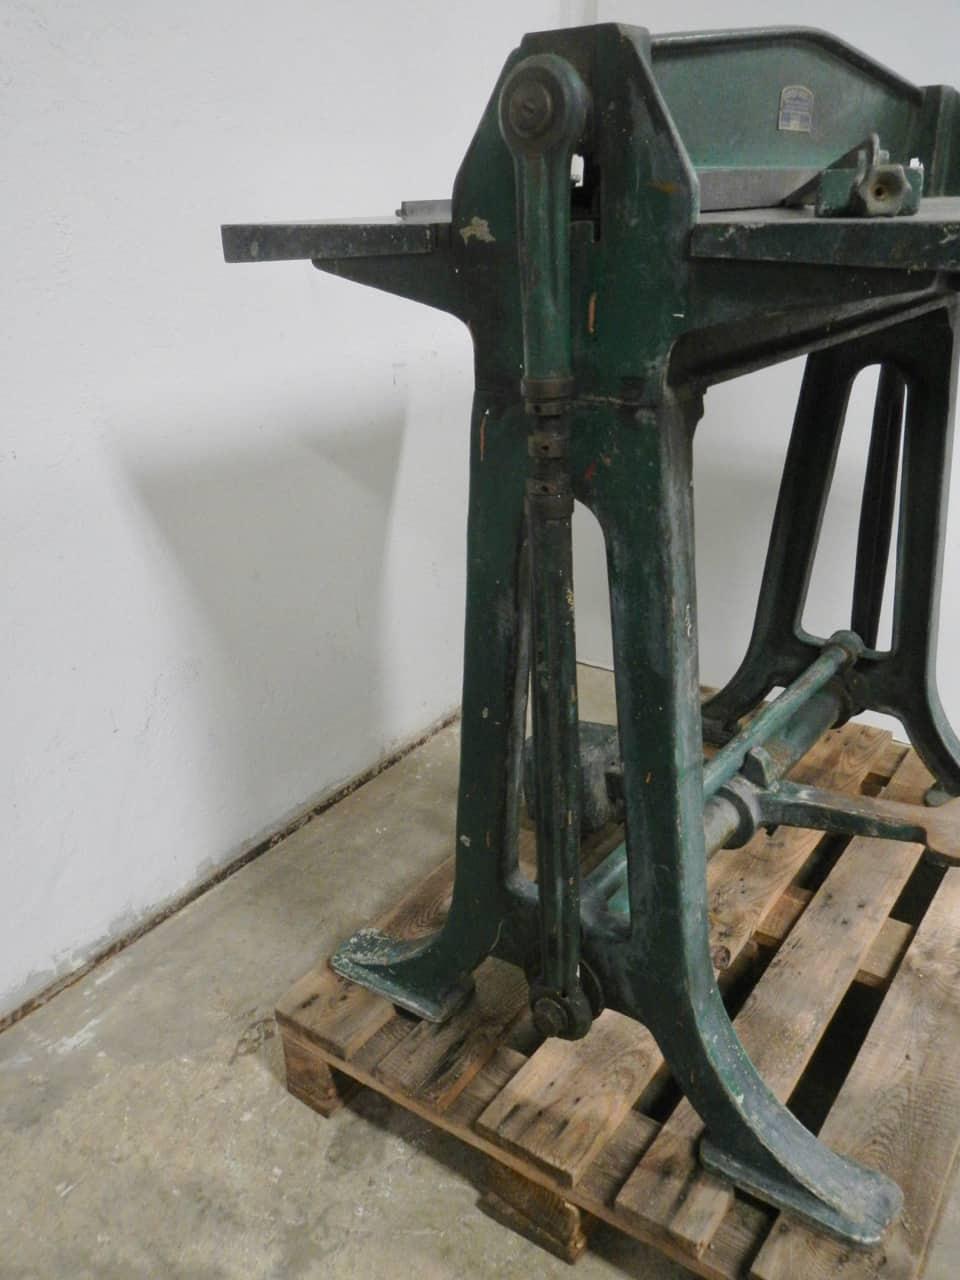 thumb7|macchina da tipografia anni 40